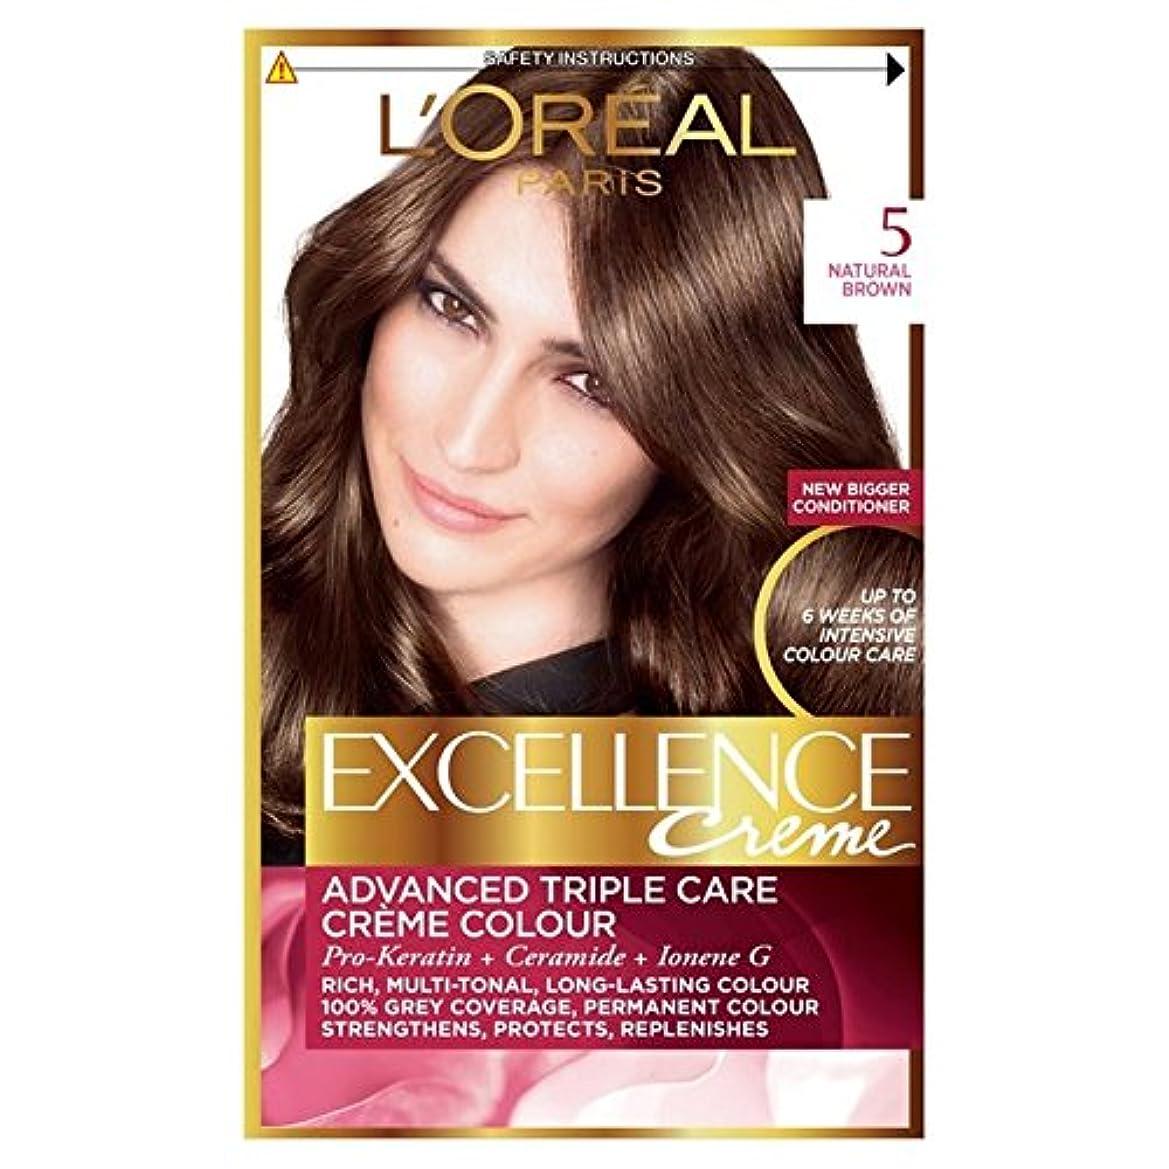 L'Oreal Excellence - Natural Brown - ロレアルの優秀さ - ナチュラルブラウン [並行輸入品]